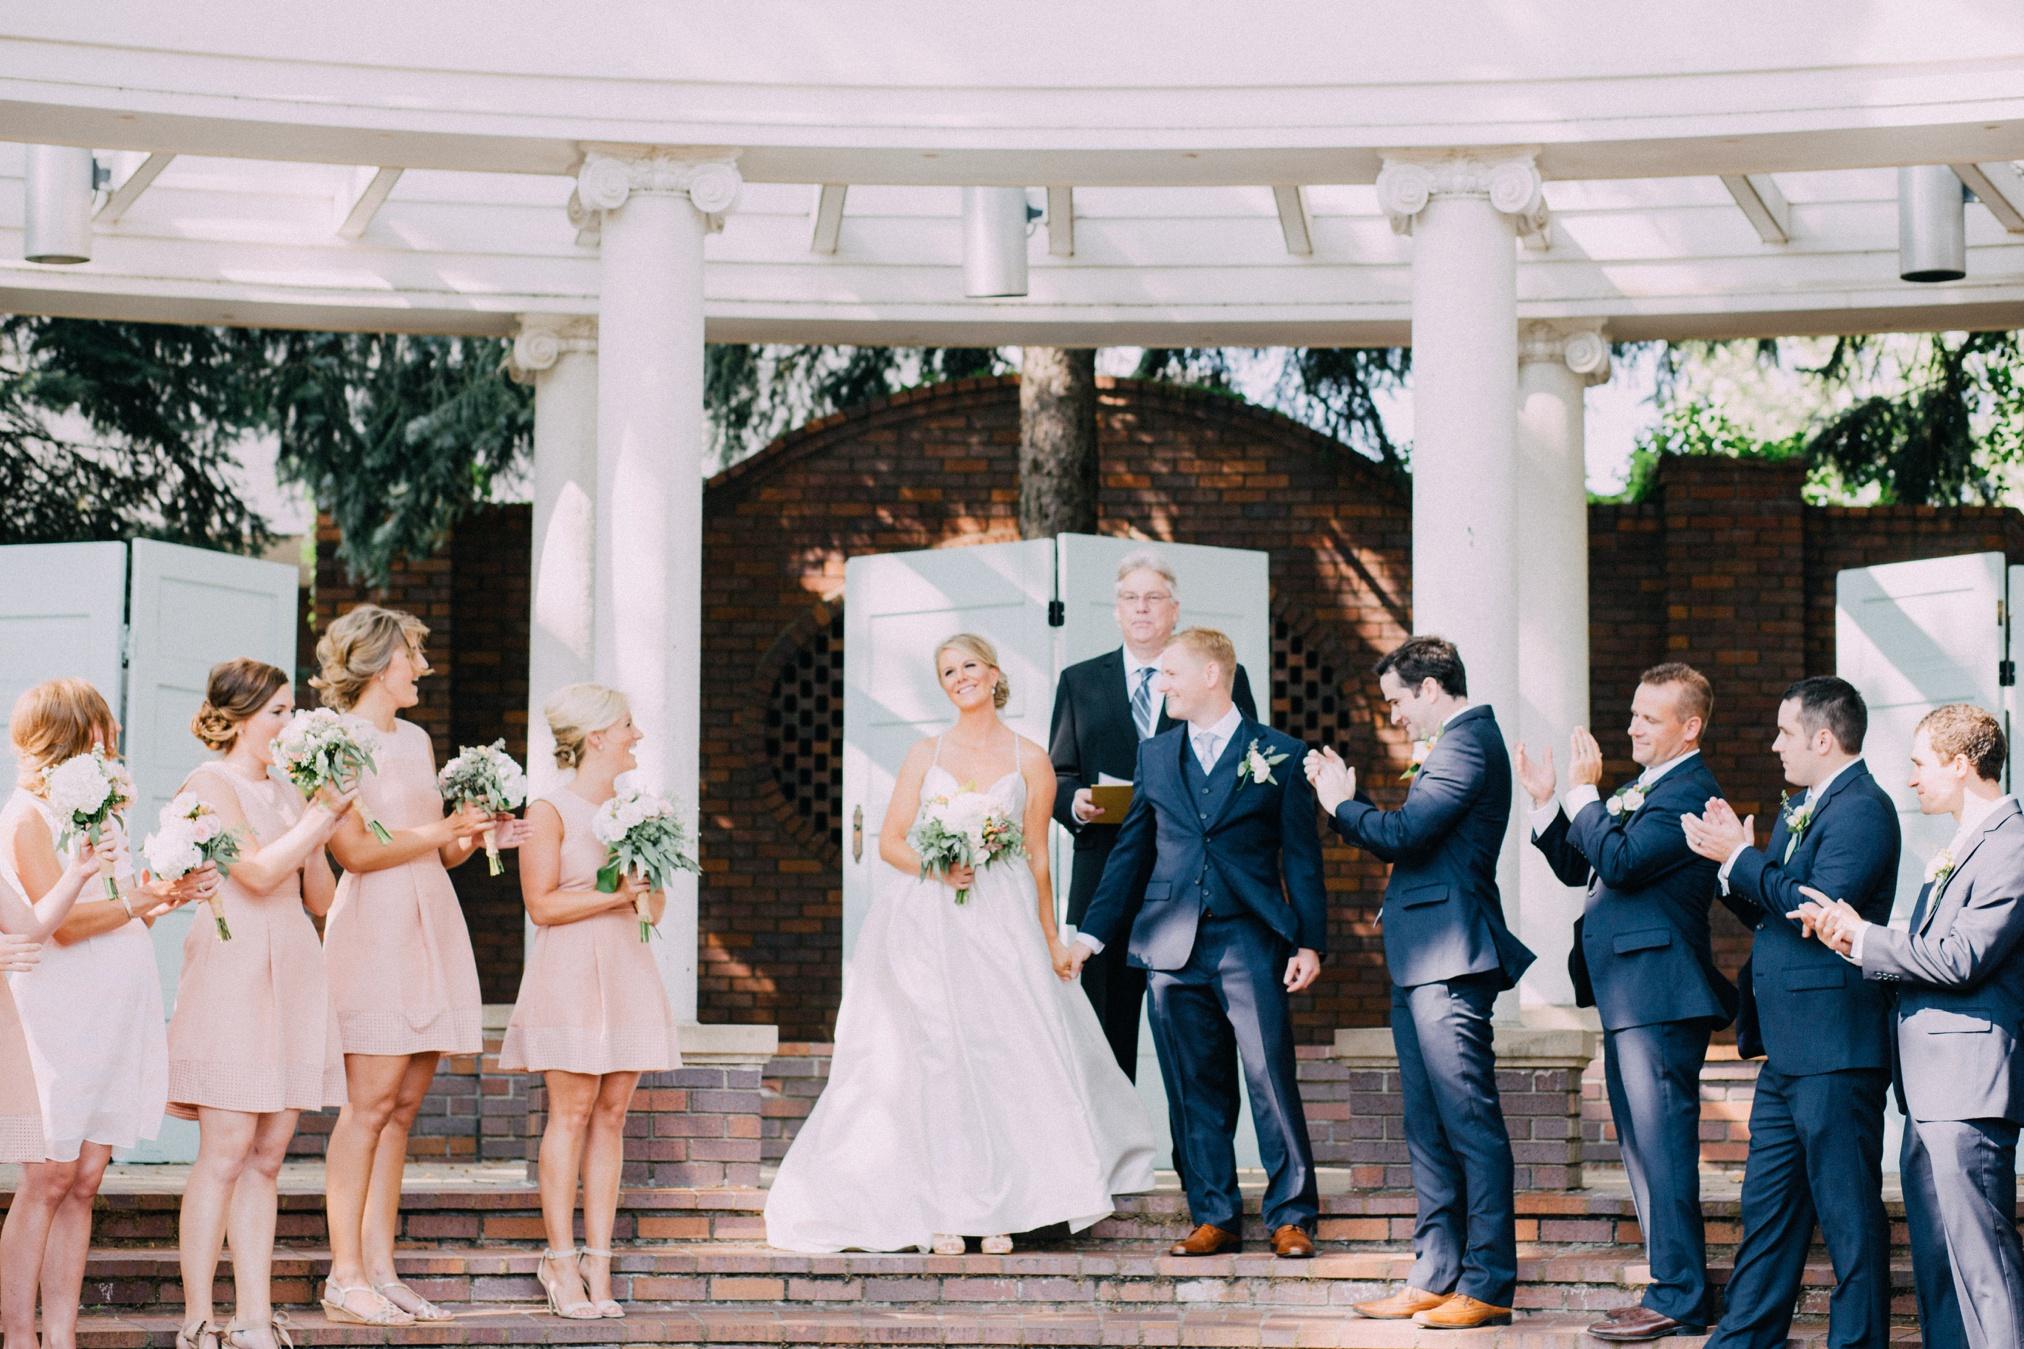 brenna+michael_wedding-446.jpg